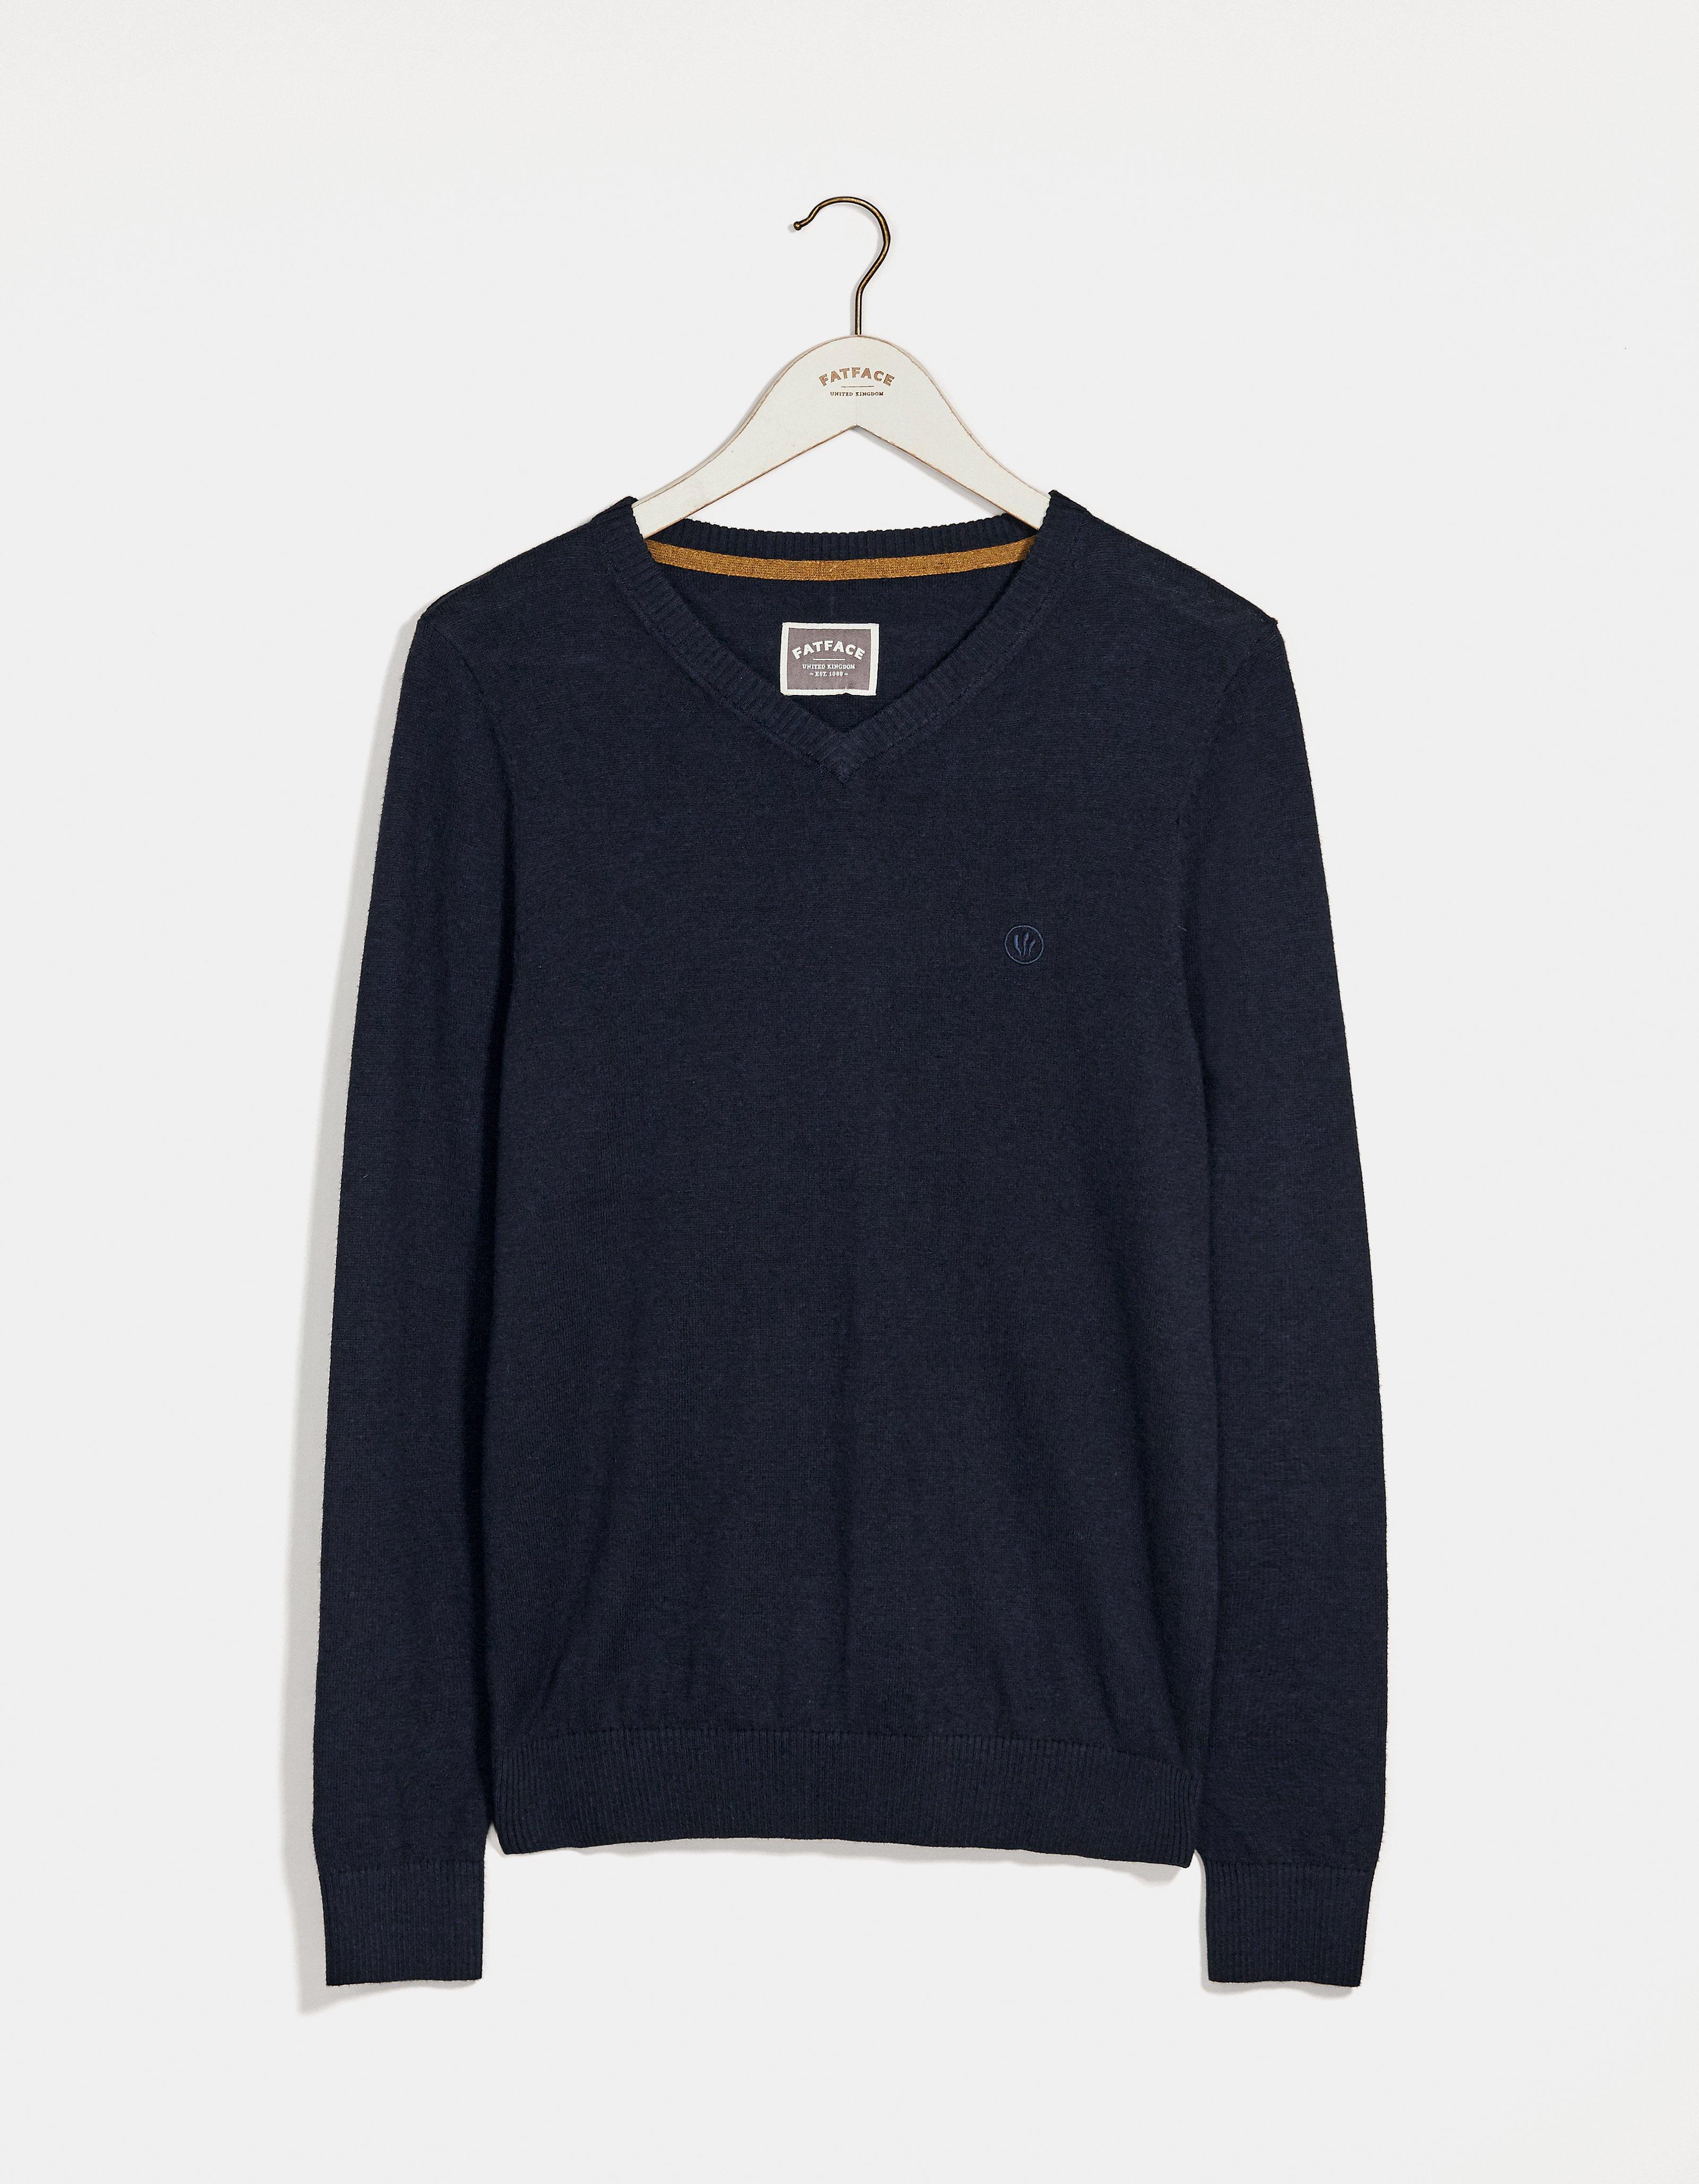 fat face cotton cashmere v-neck sweater